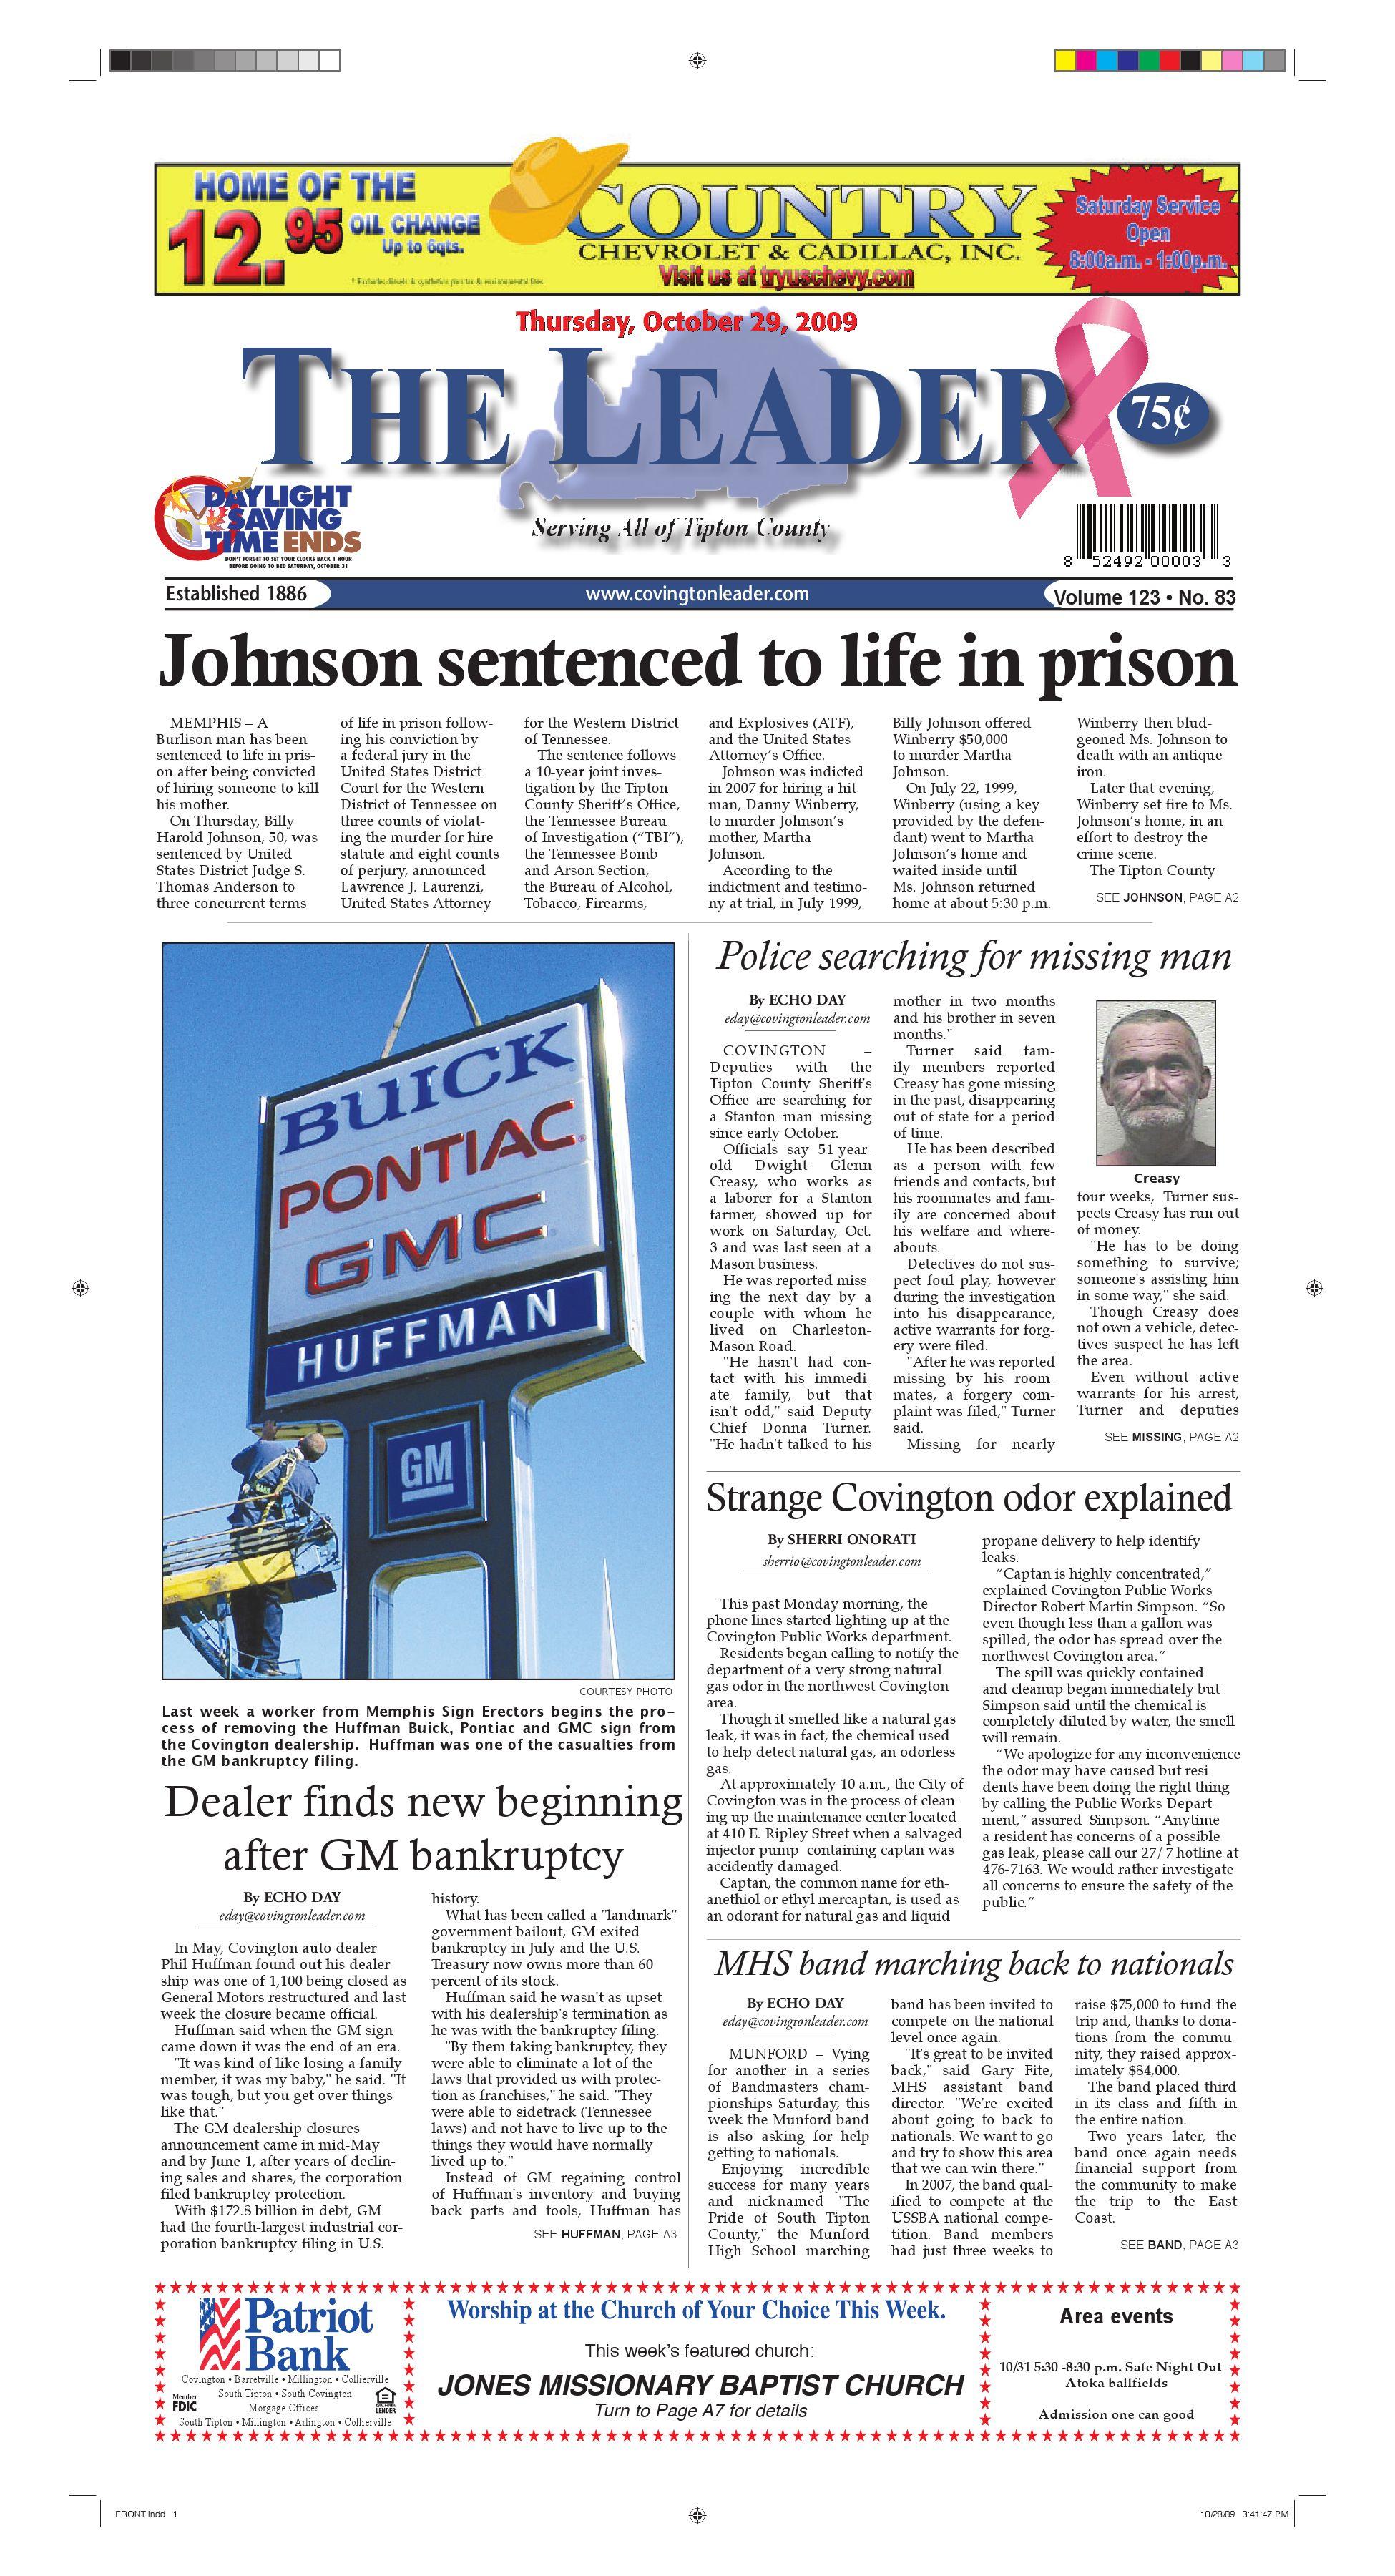 shiloh by bobby anne mason essay It was an important battle in the tide of response to bobbie ann mason shiloh what strikes shea bridenbeck english 133-05 shiloh essay 3/11/11 shiloh essay.